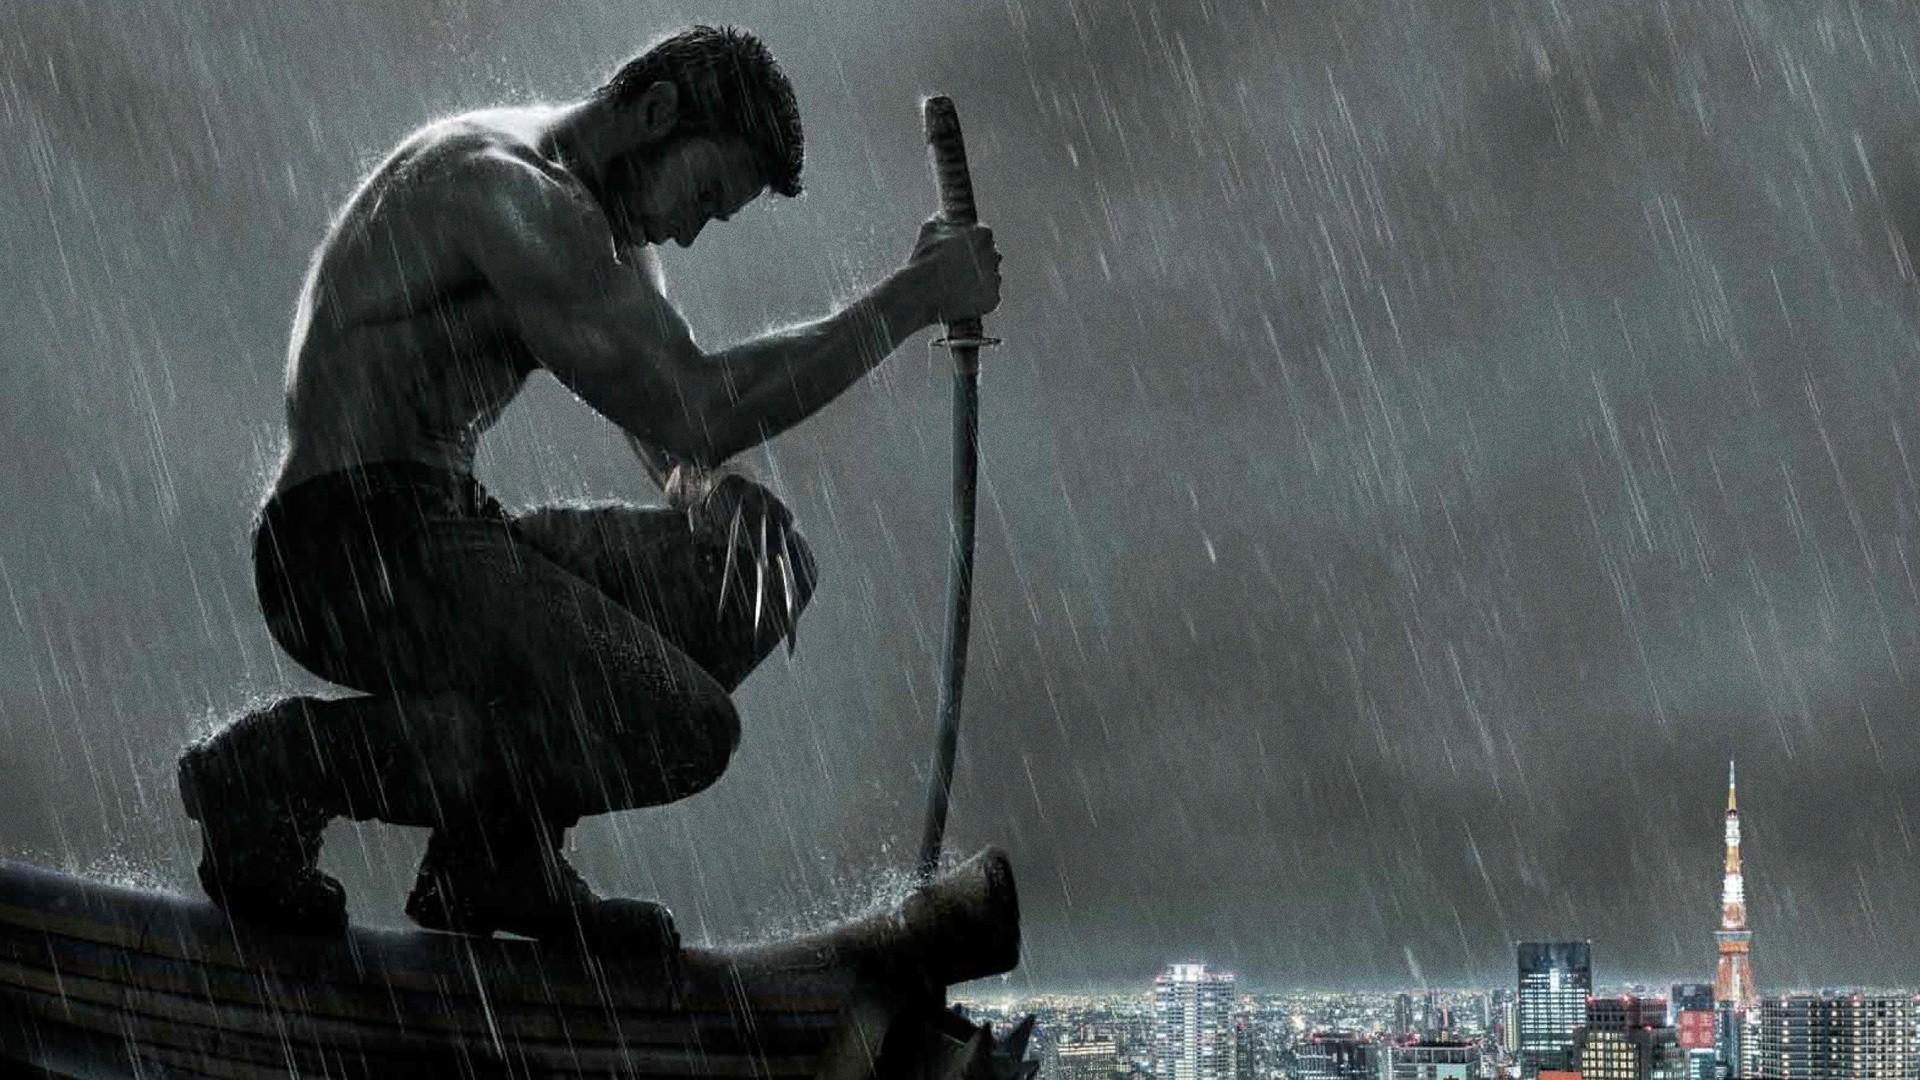 wolverine heavy rain katana hugh jackman paris